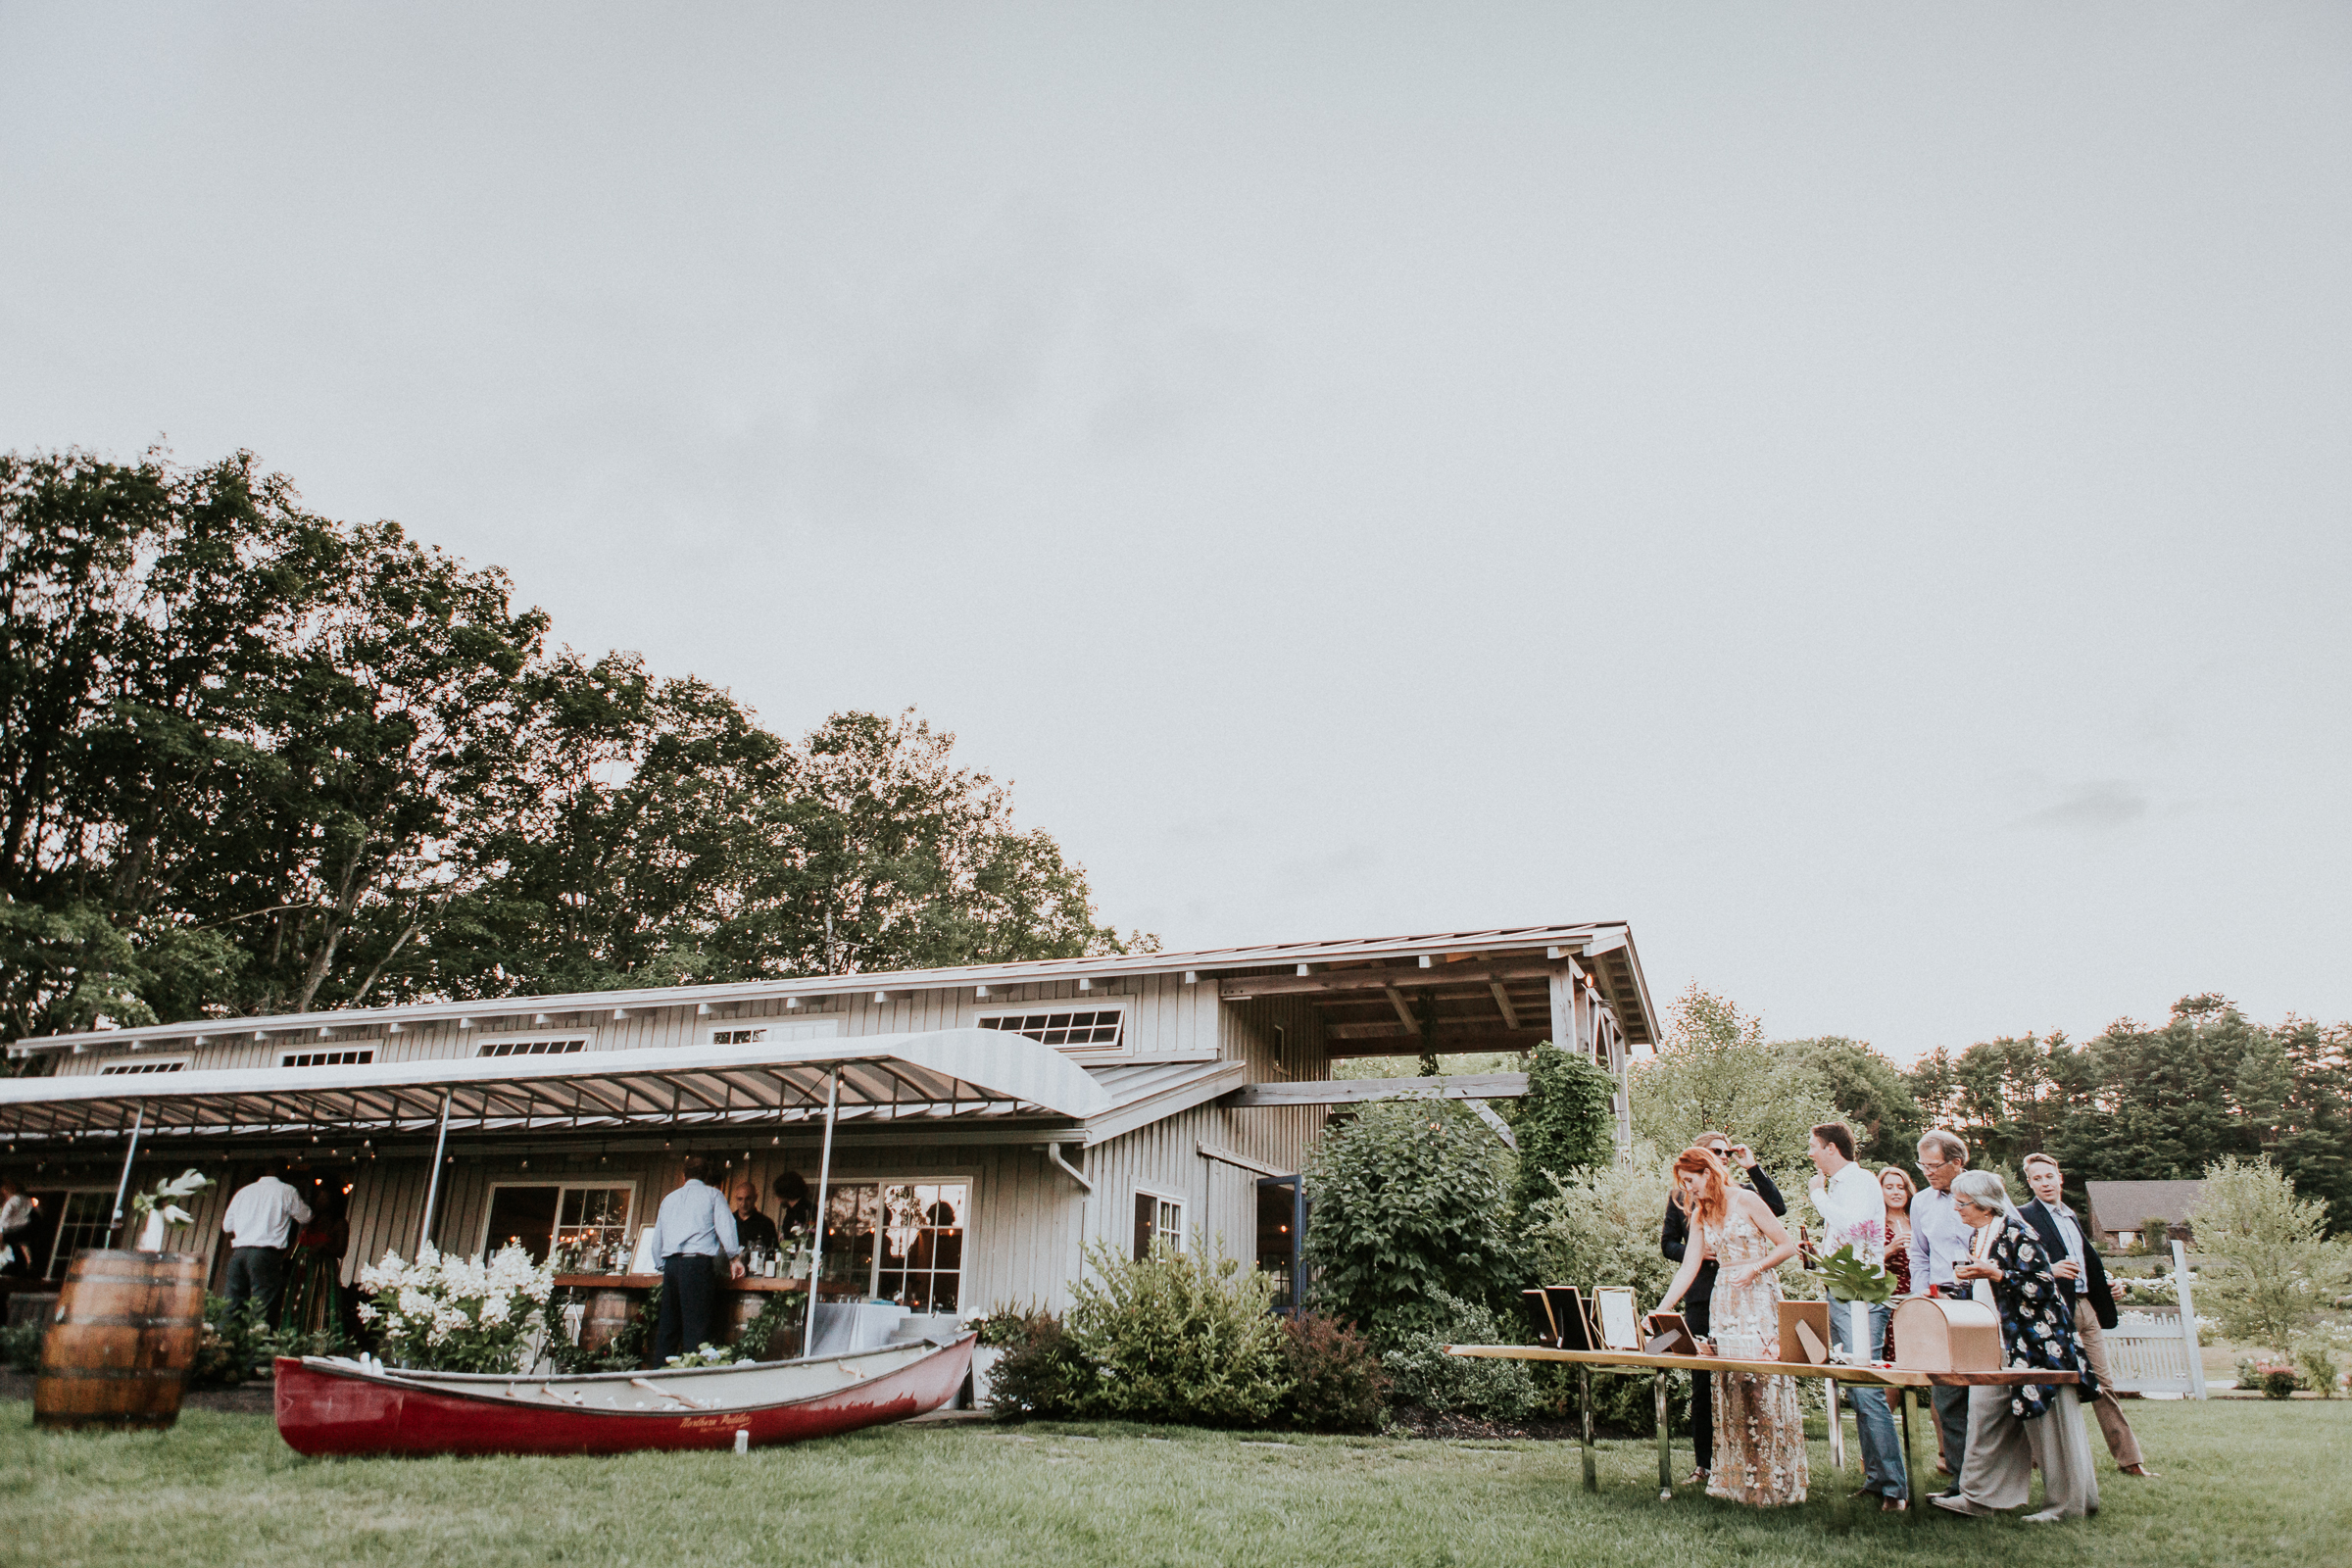 Marianmade-Farm-Wiscasset-Maine-Fine-Art-Documentary-Wedding-Photographer-Elvira-Kalviste-Photography-141.jpg